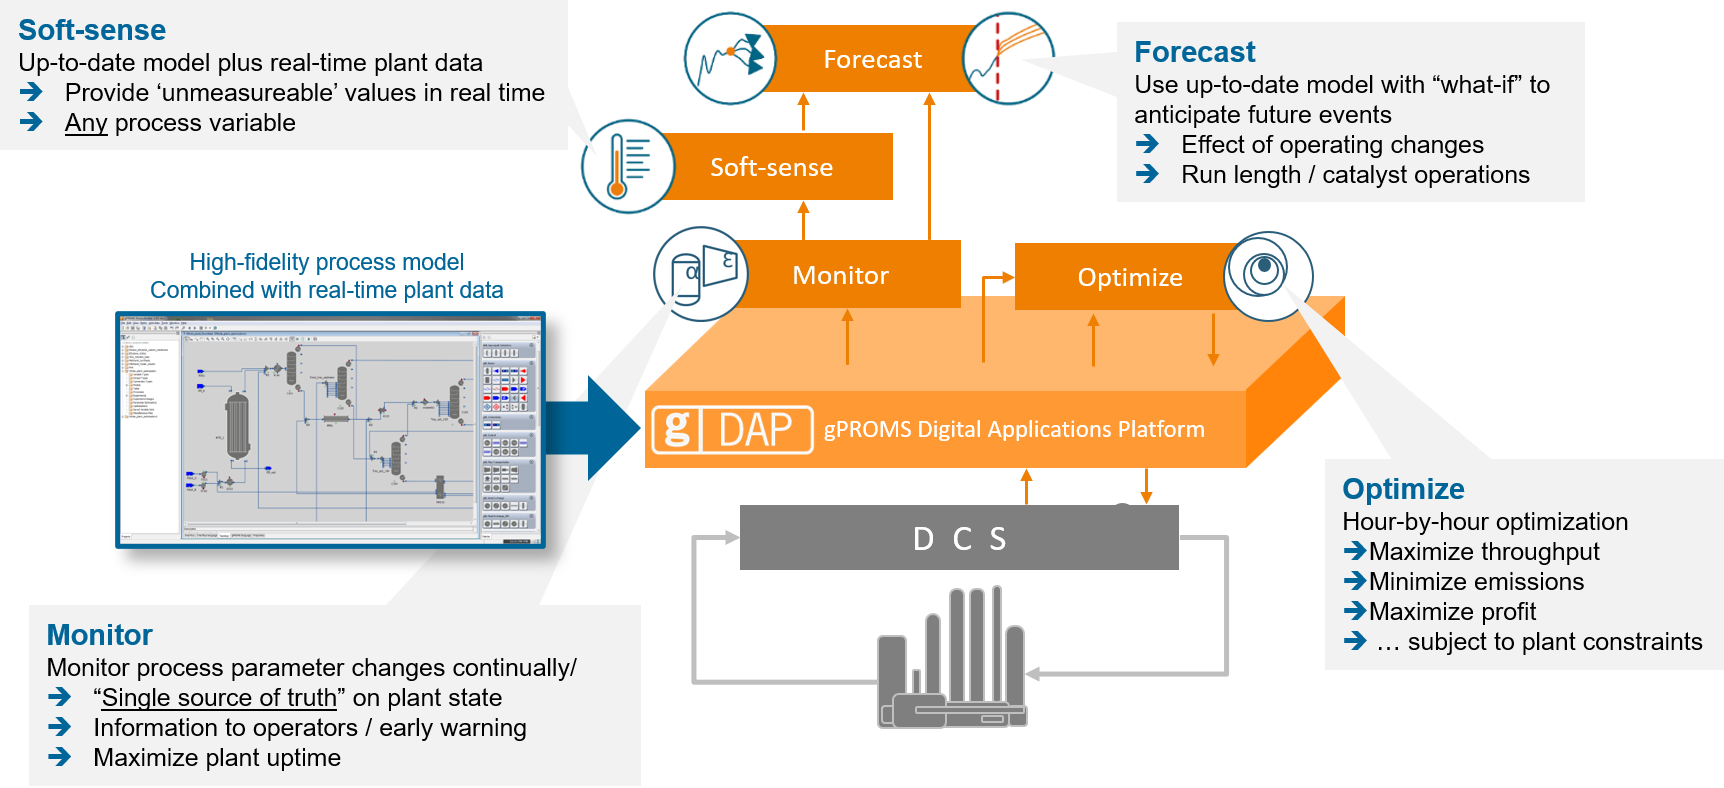 Digital Operations built on the gPROMS digital Applications Platform